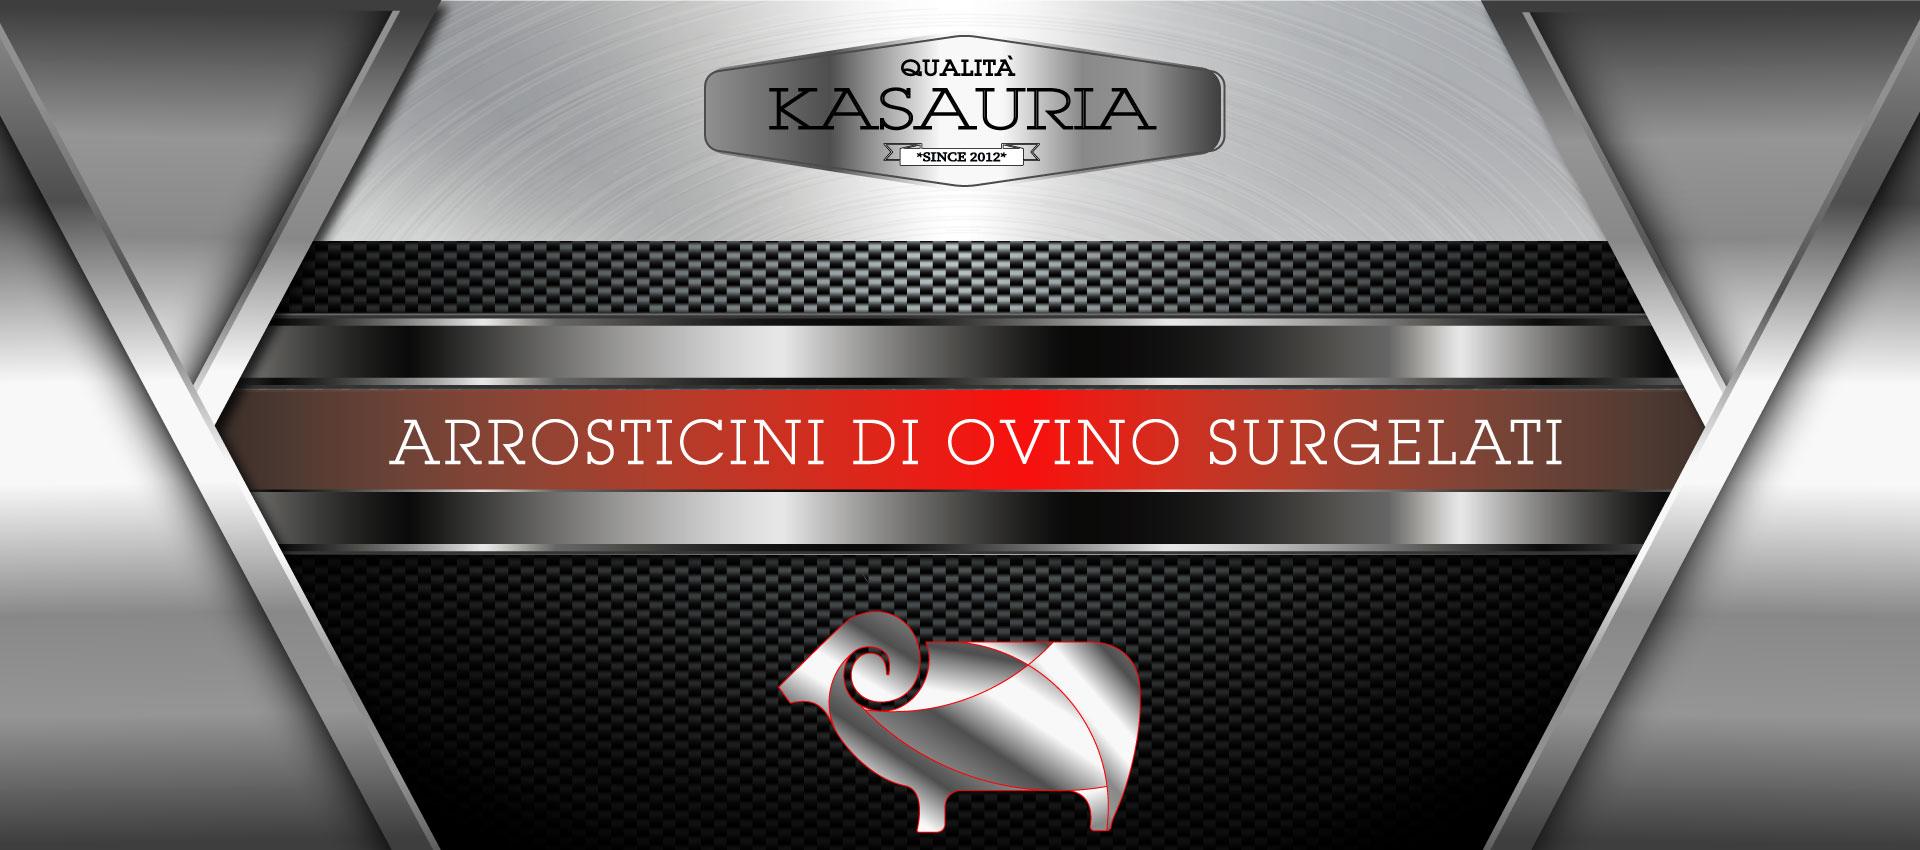 Kasauria_sito_copertina_surgelati